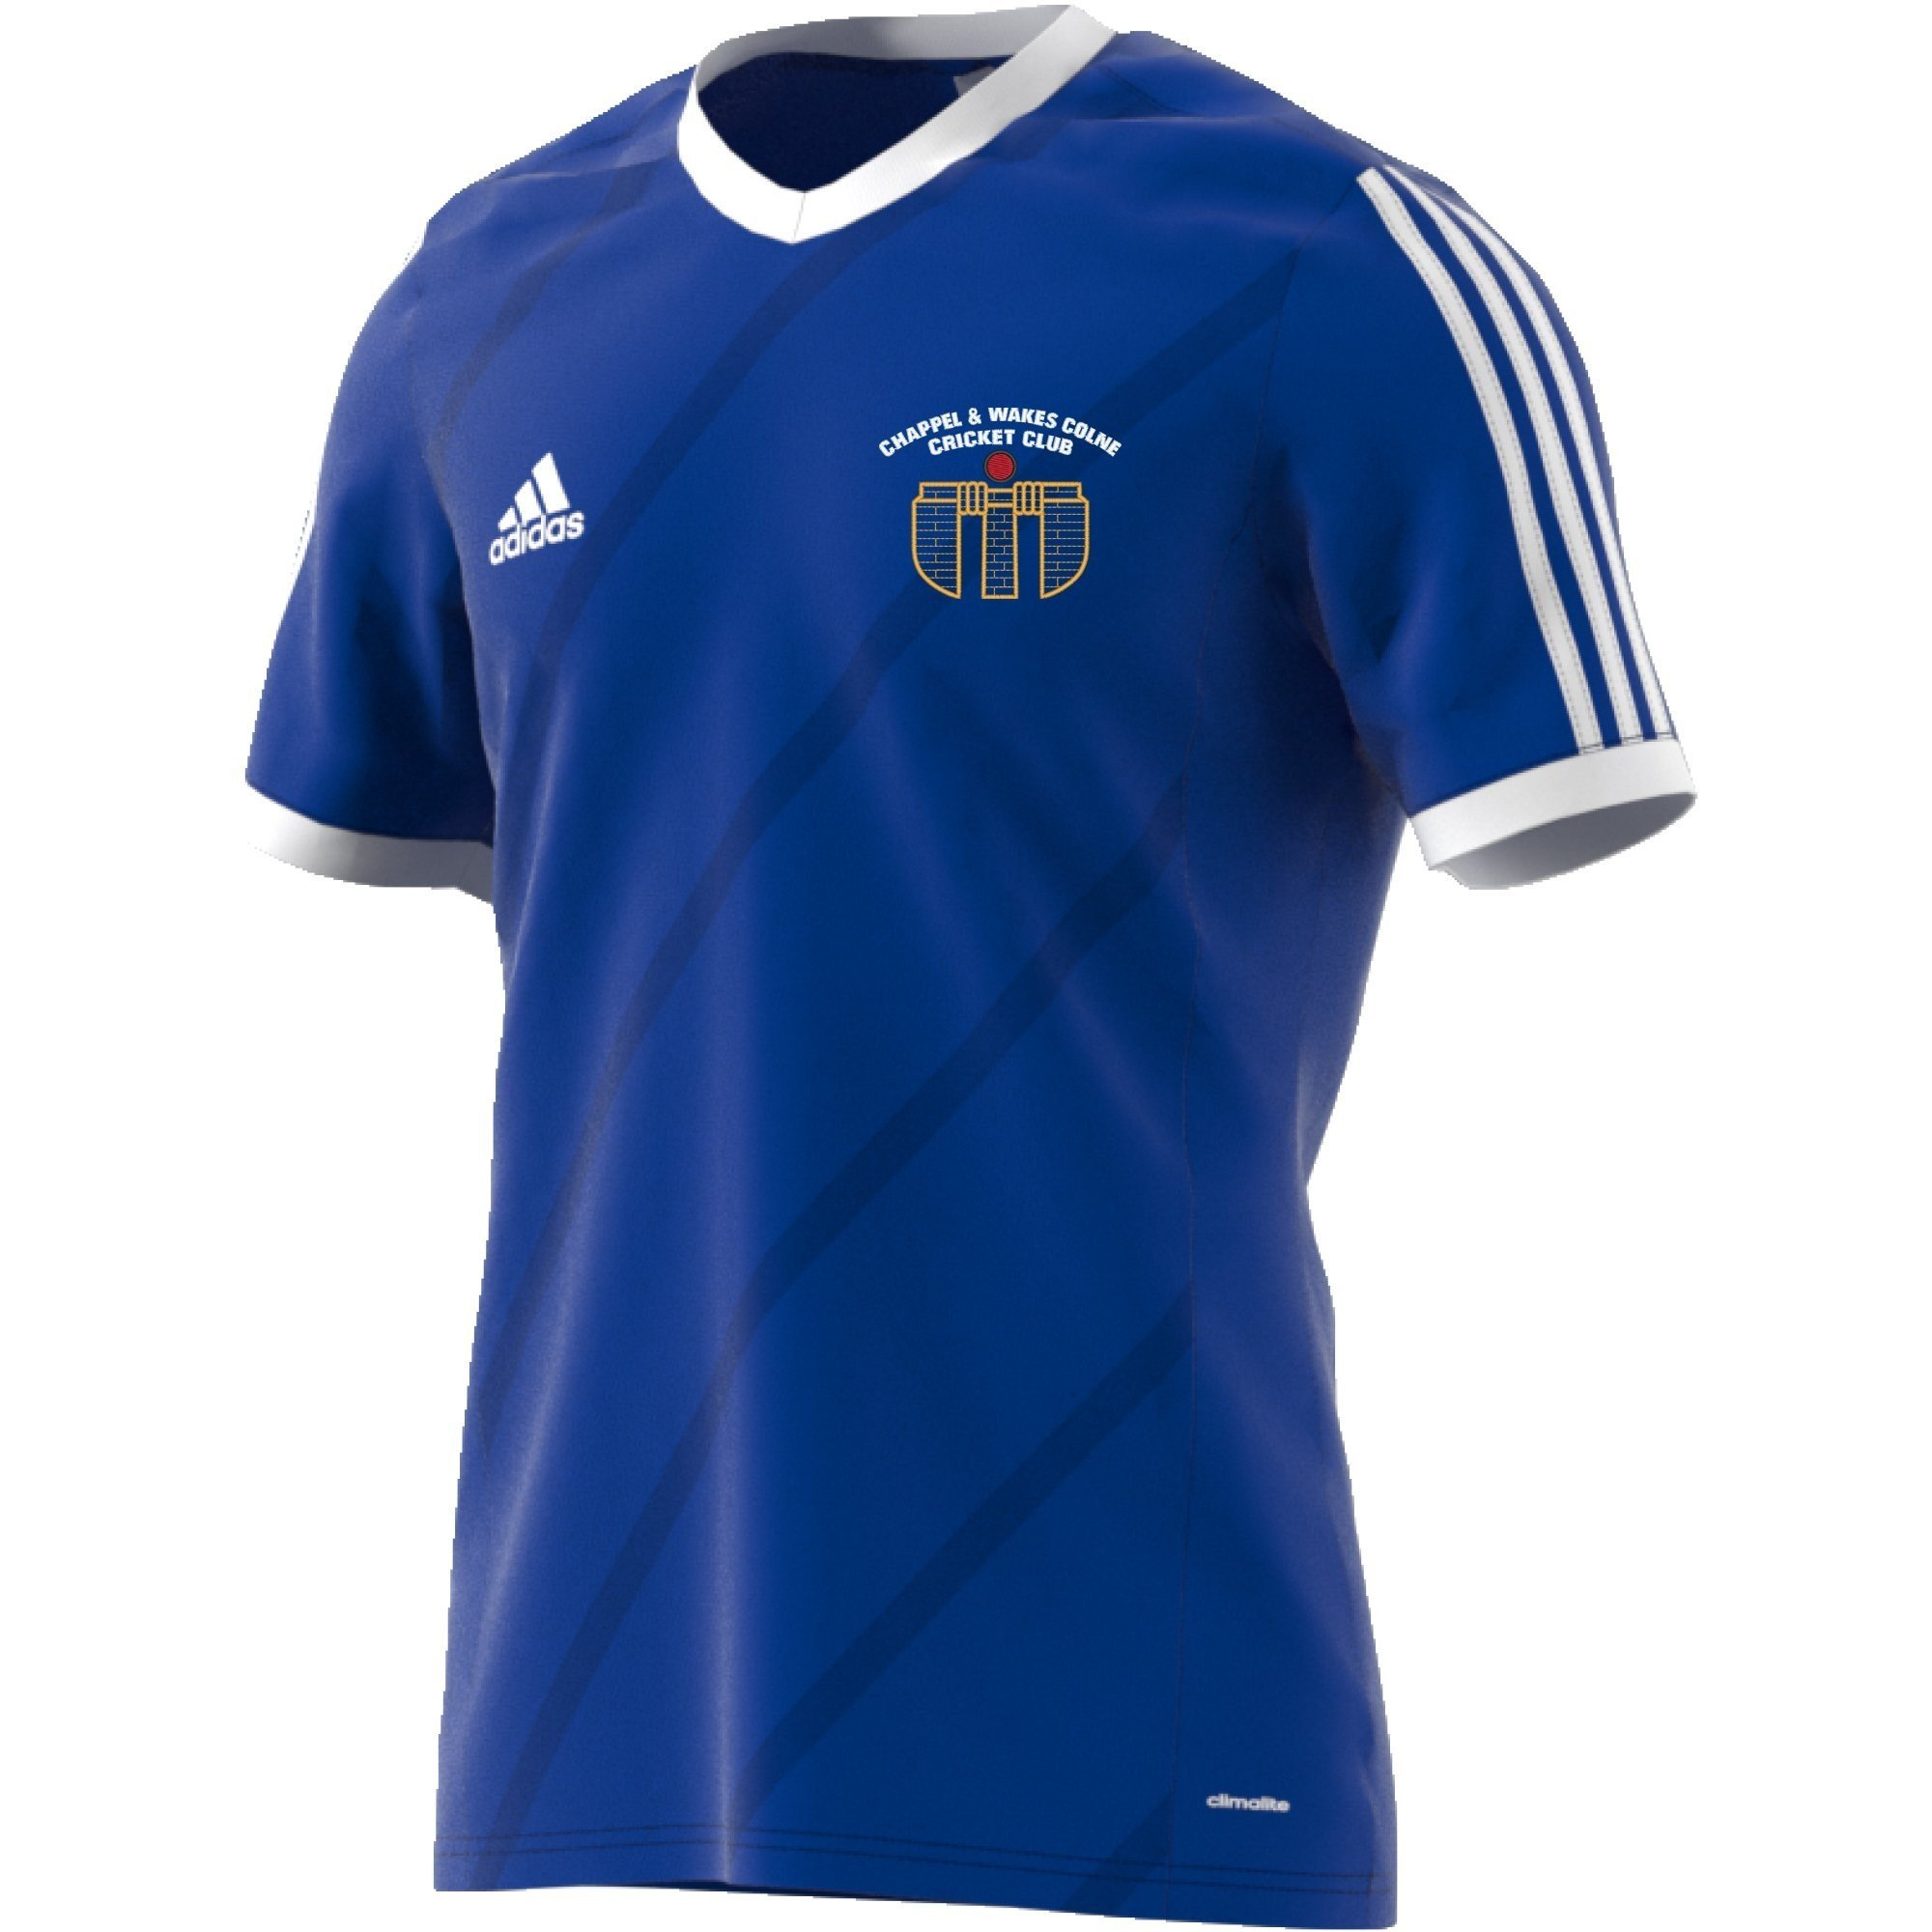 Chappel & Wakes Colne CC Adidas Blue Junior Training Jersey